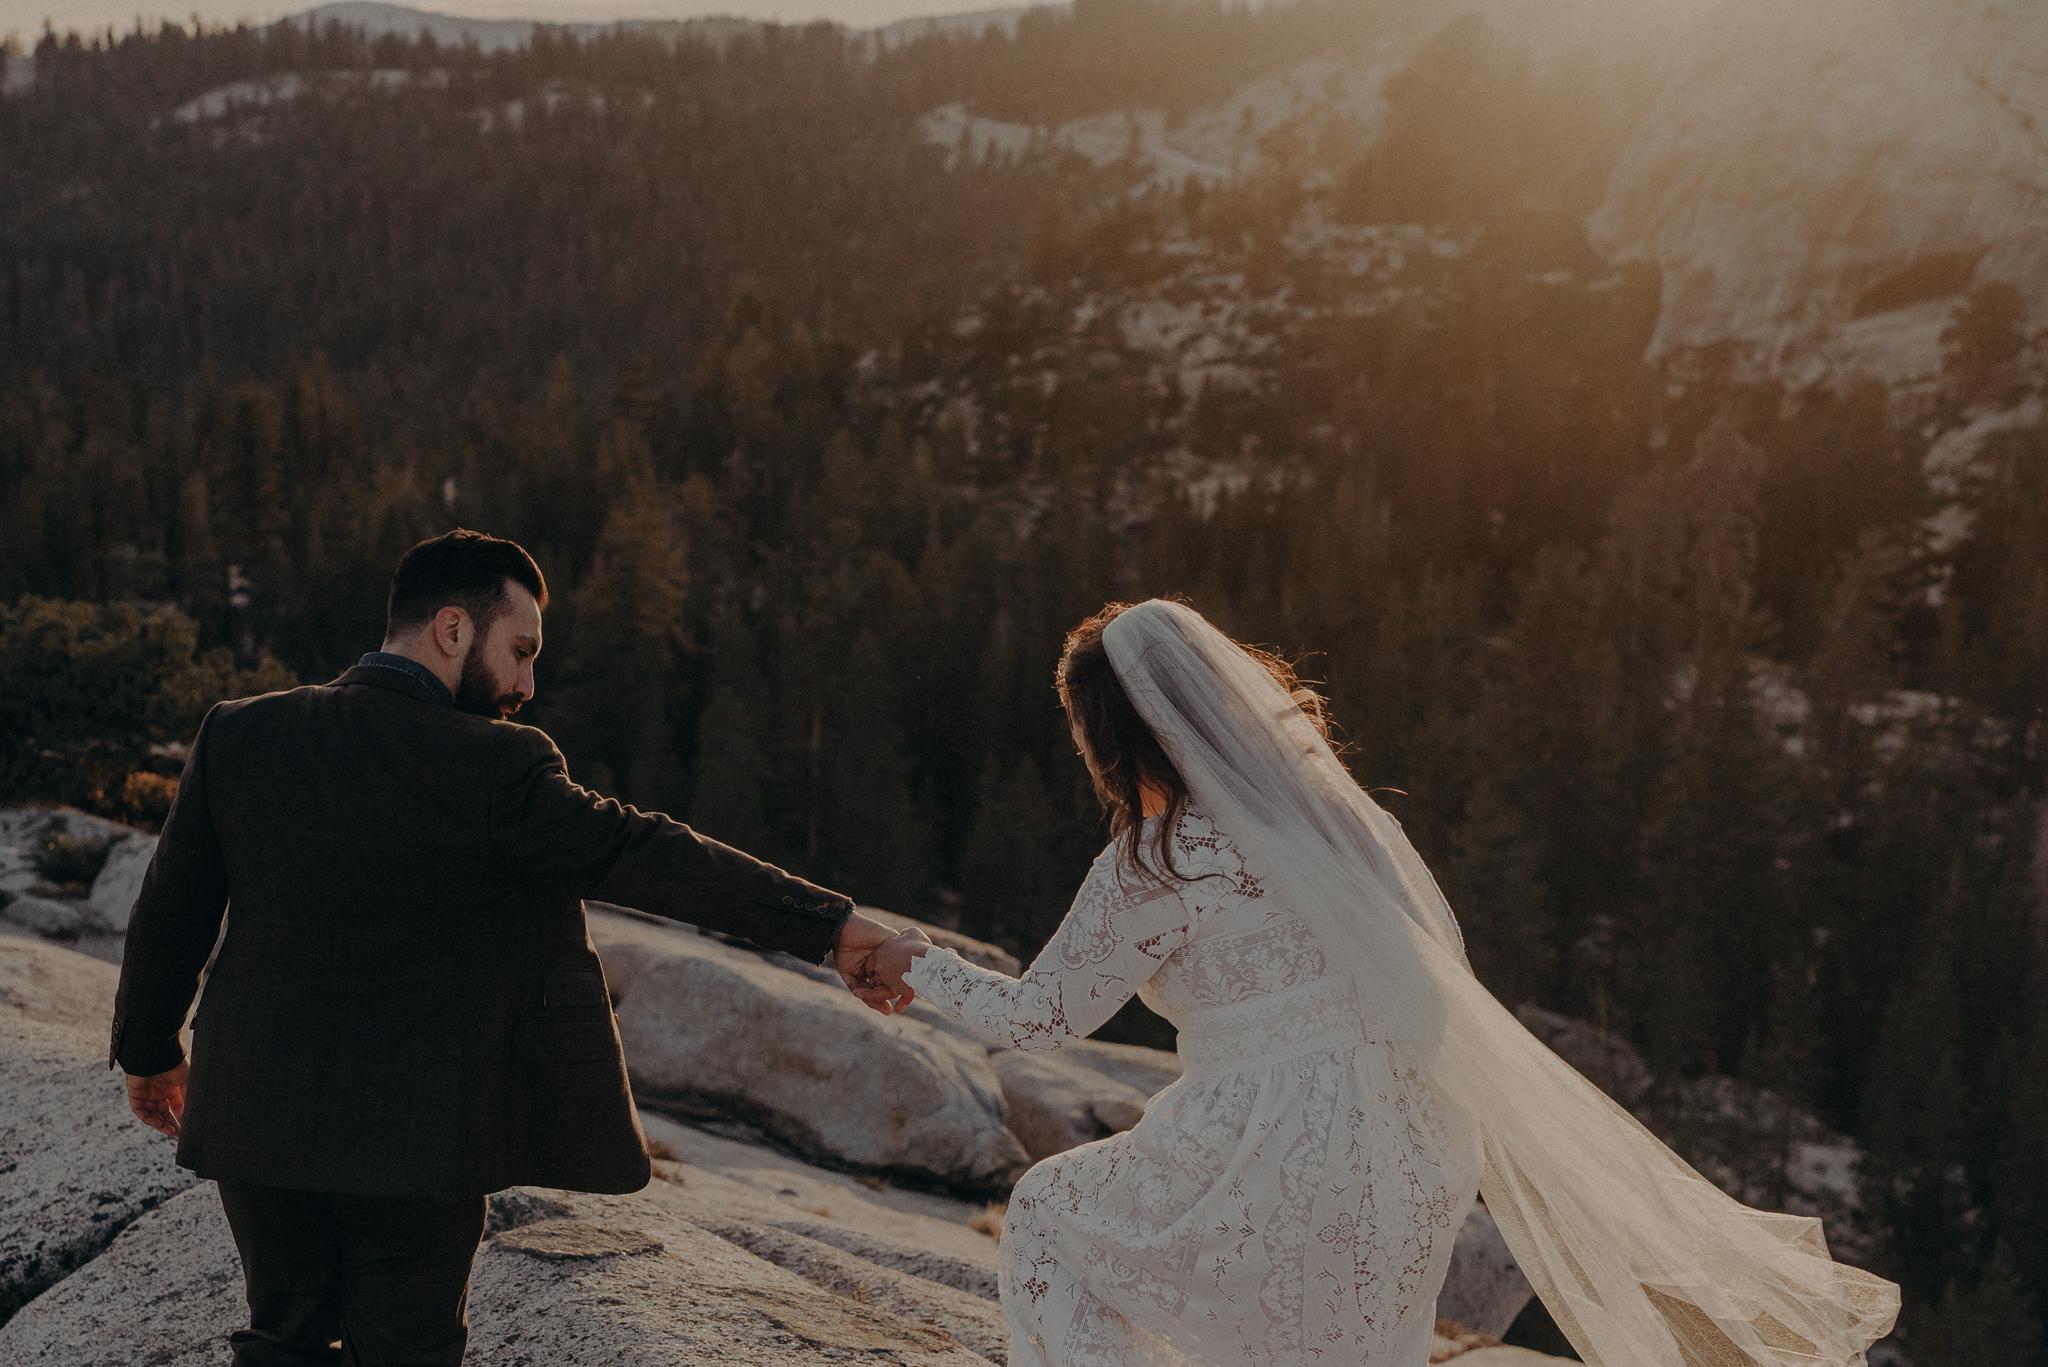 Yosemite Elopement Photographer - Evergreen Lodge Wedding Photographer - IsaiahAndTaylor.com-047.jpg